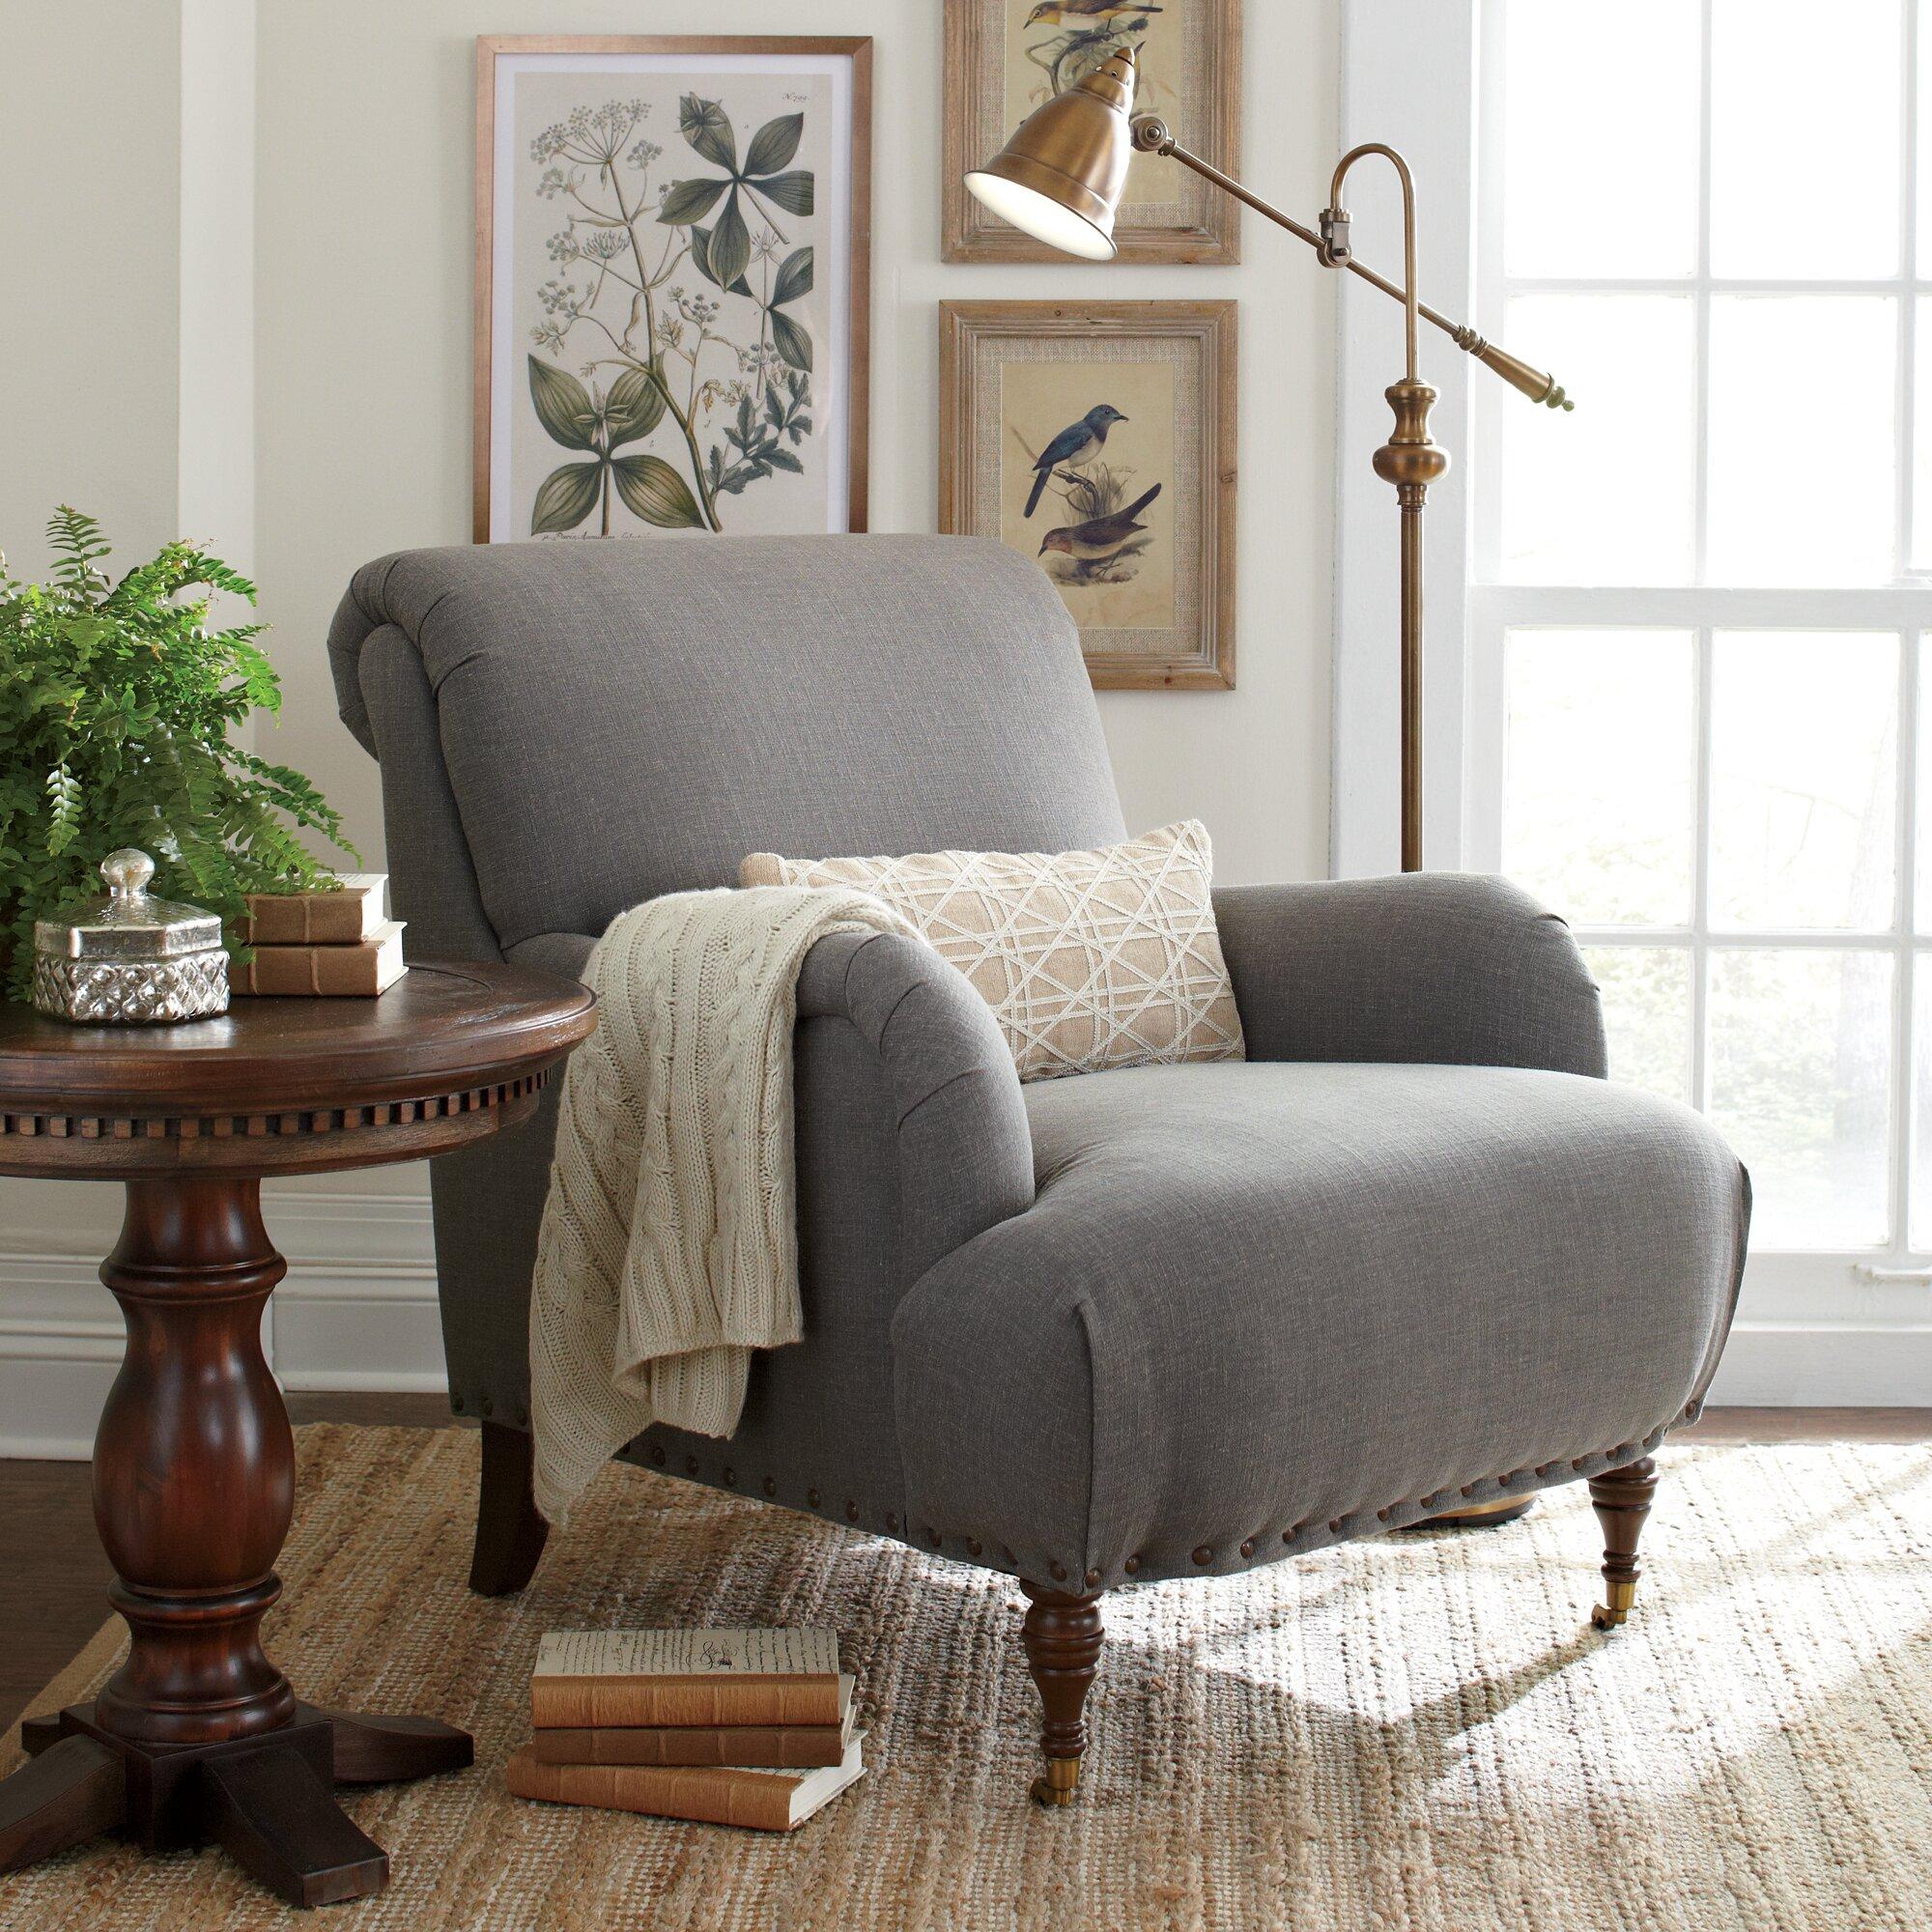 Living Room Lamp Sets Harding 2 Piece Lamp Set Reviews Birch Lane